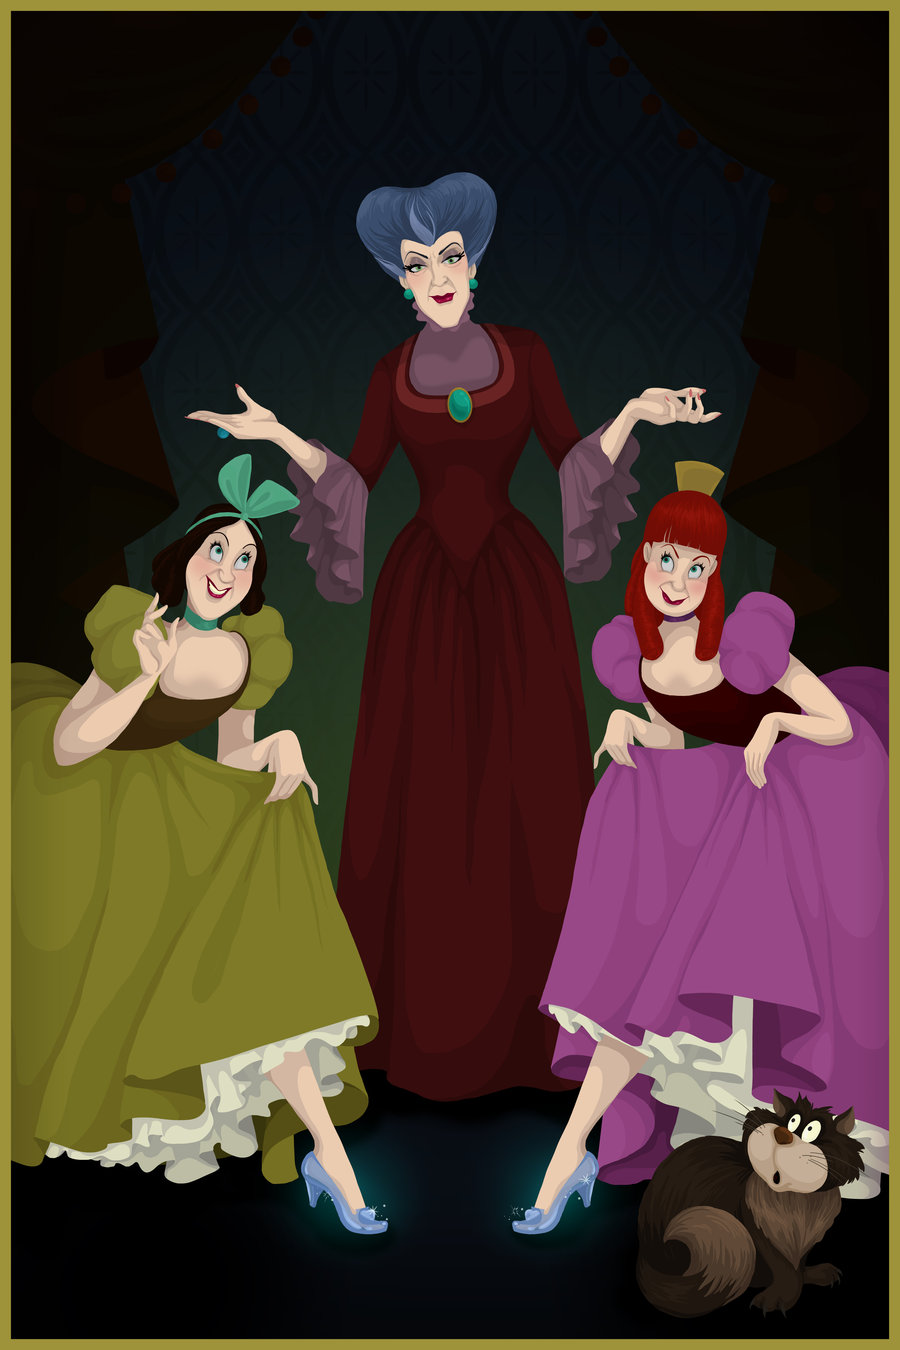 the_tremaine_trio__s_triumph_by_justin_mctwisp-d4udvtd